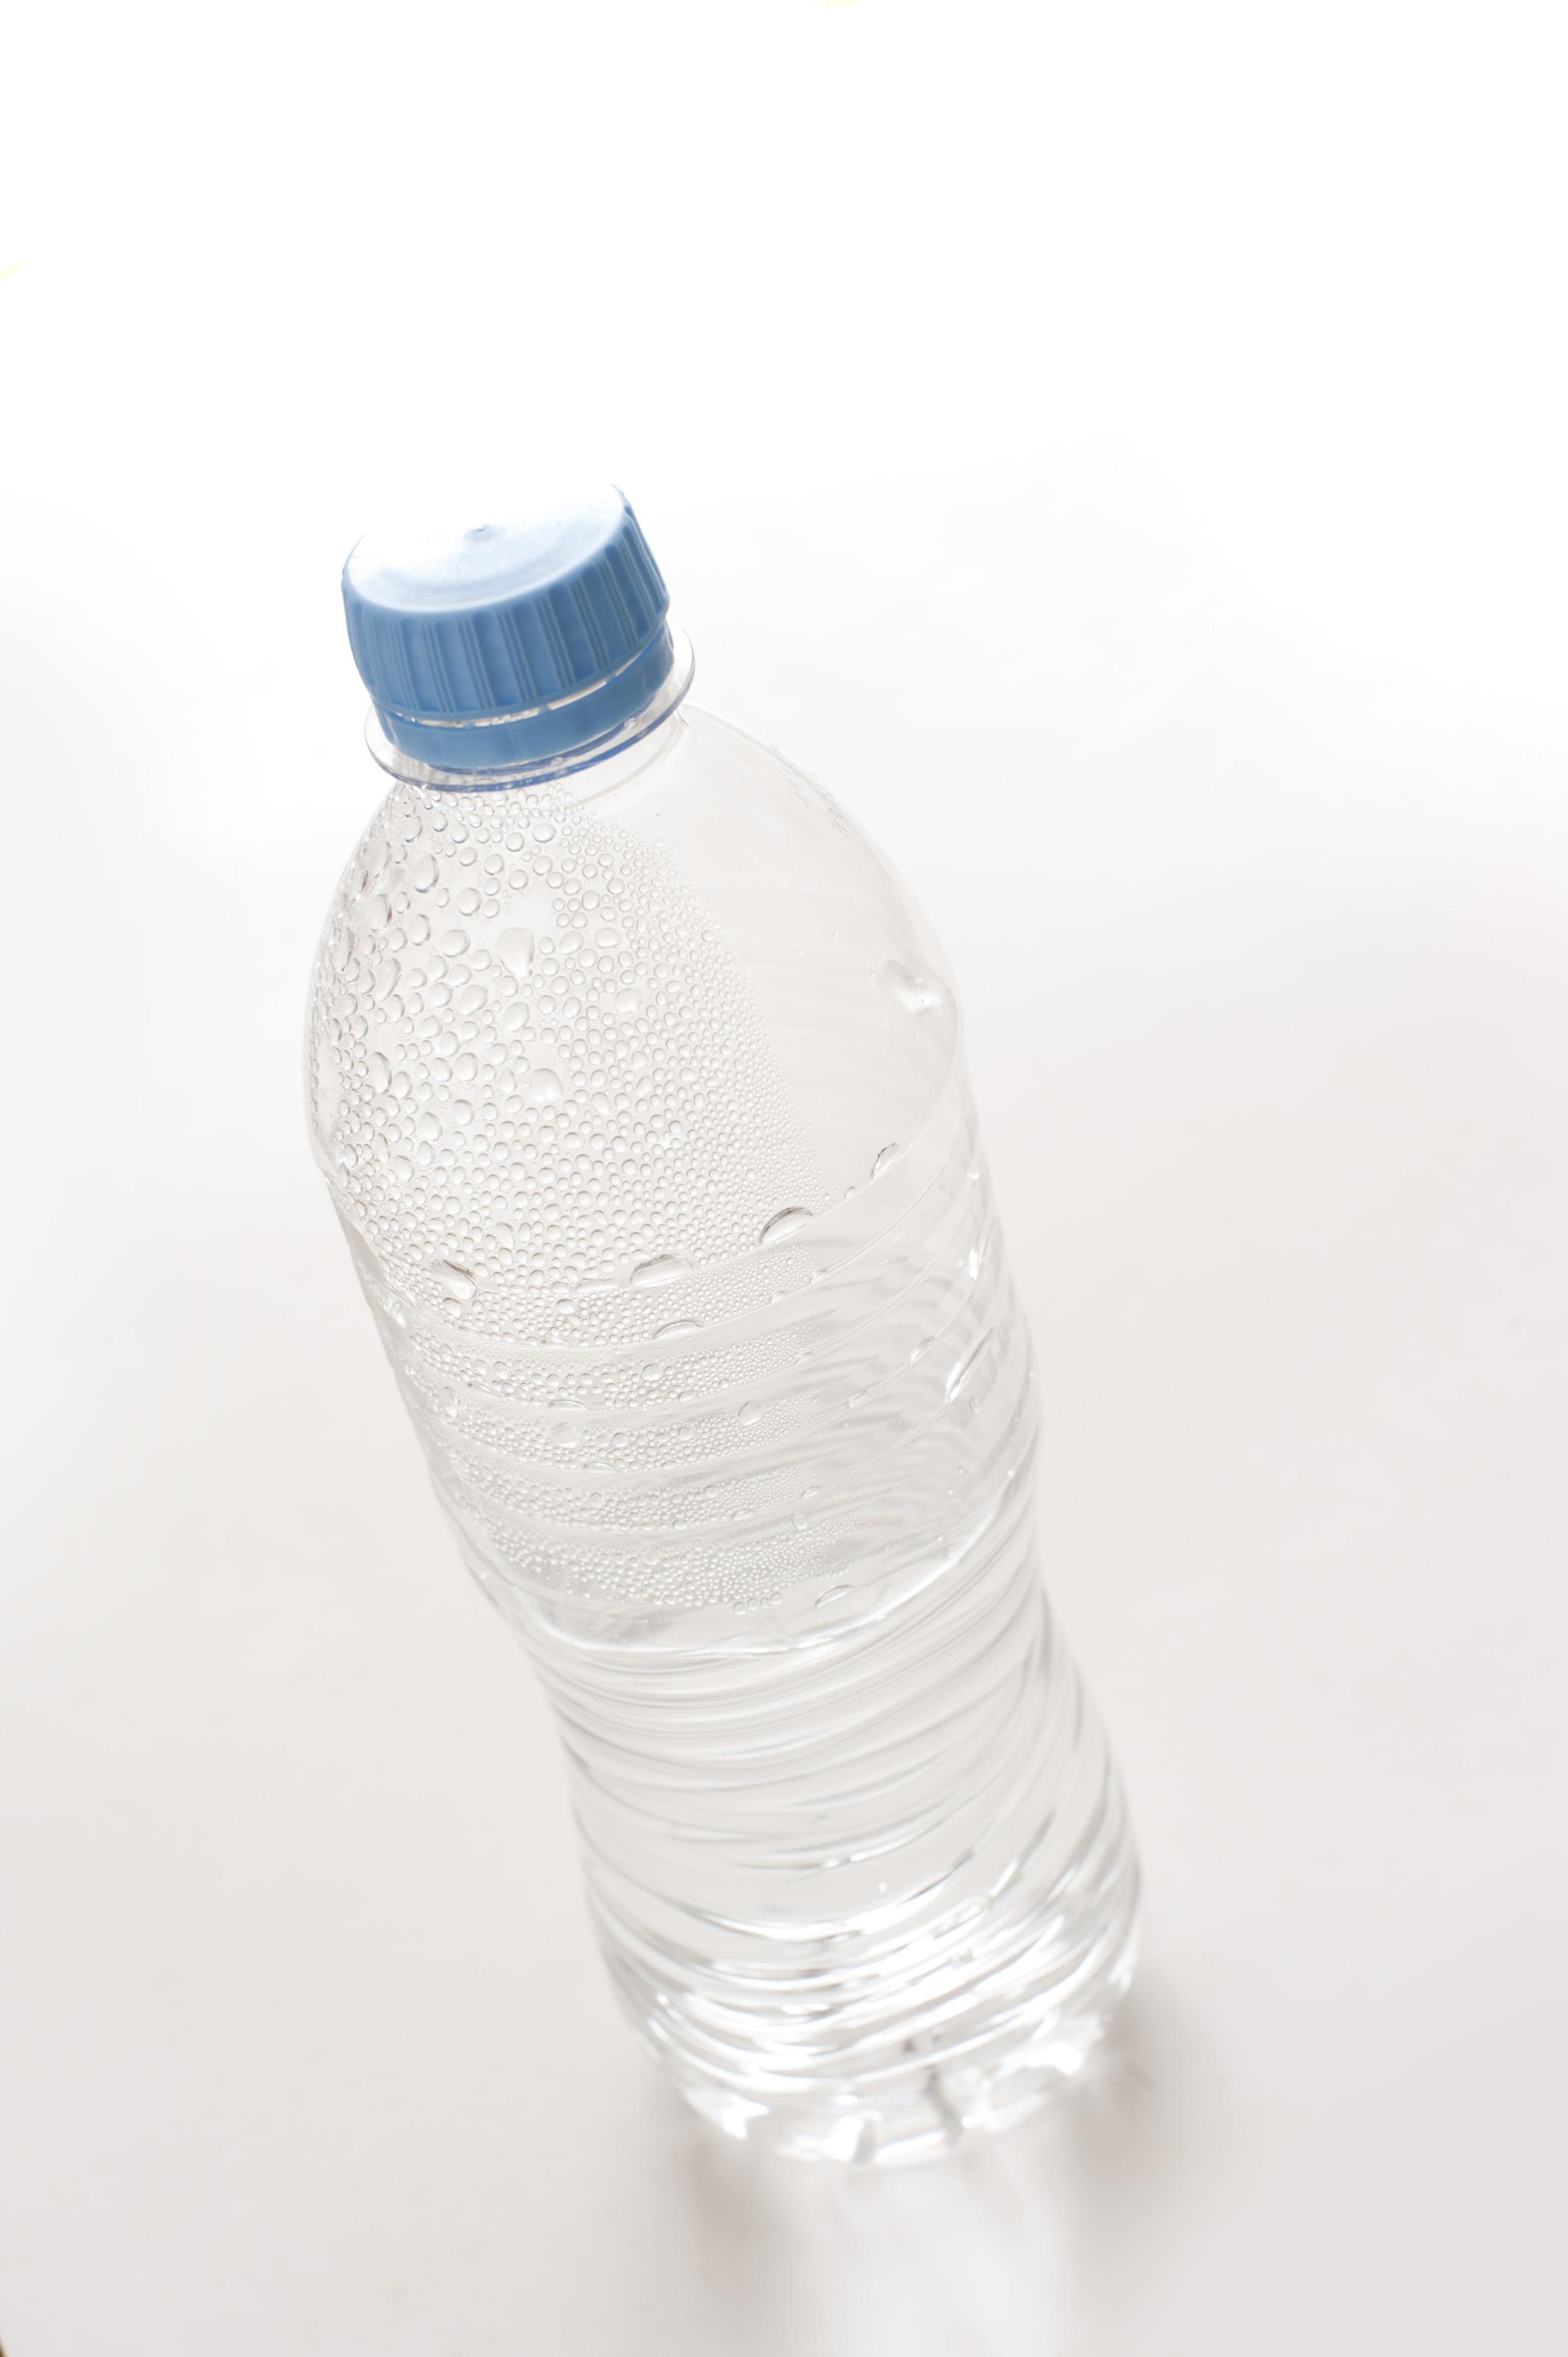 Free Stock Photo 10452 Empty Plastic Water Bottle